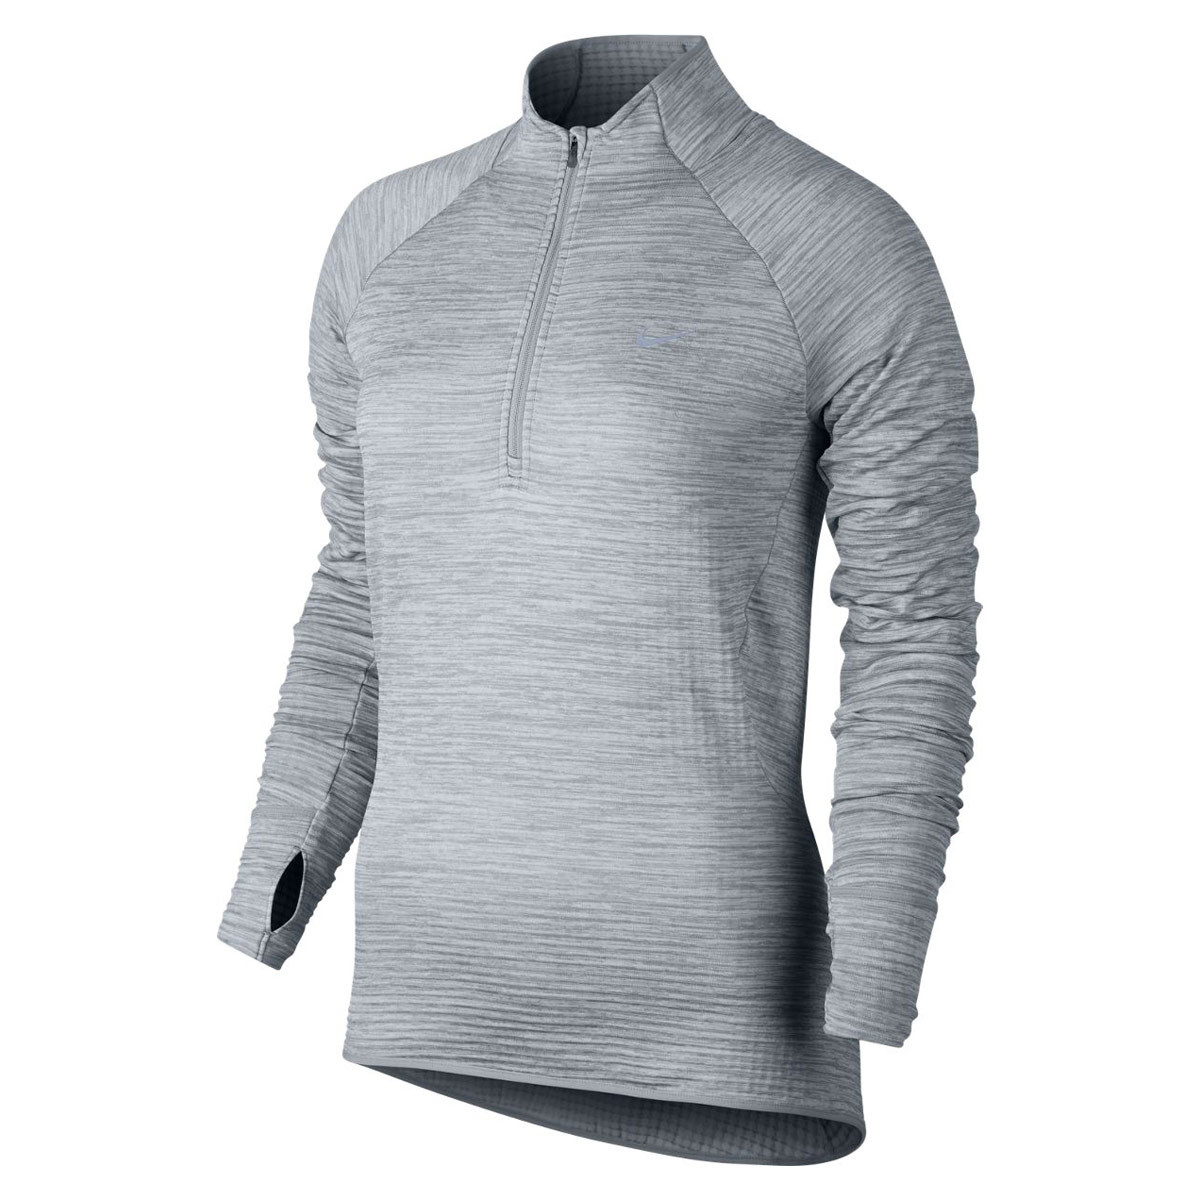 Nike Element Sphere Long Sleeve Half Zip - Laufshirts für Damen - Grau |  21RUN